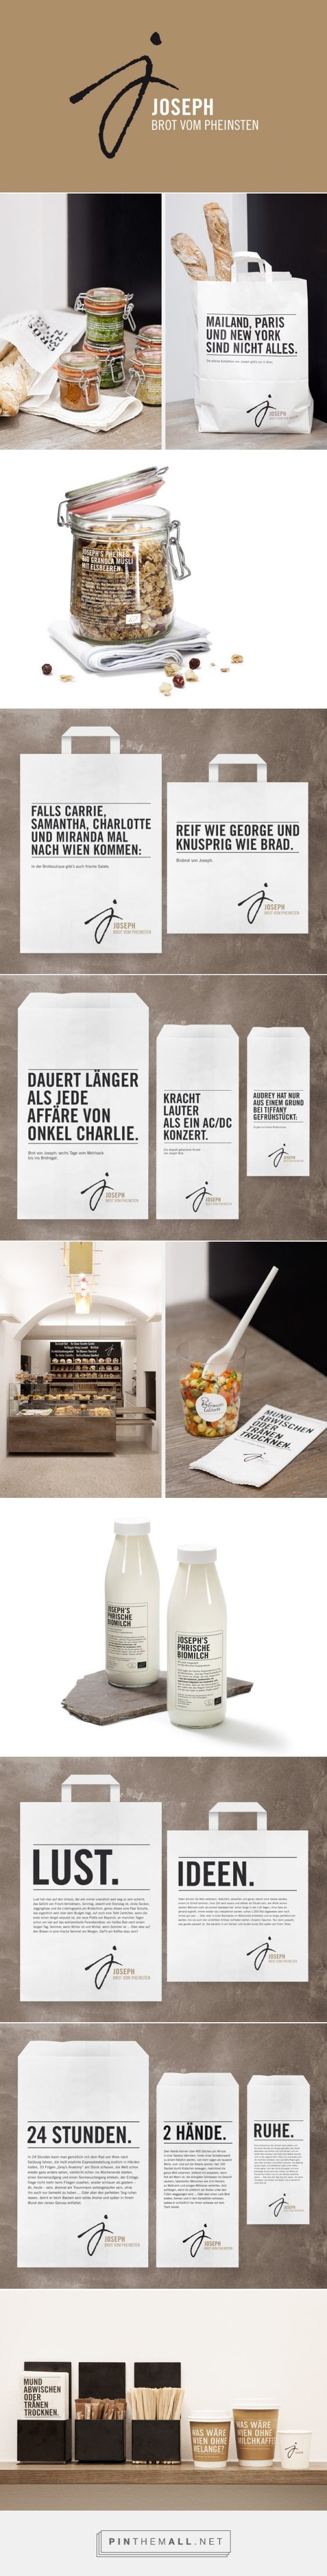 restaurants branding | Martin Dvorak, Agentur für Gestaltung packaging branding for Joseph Brot